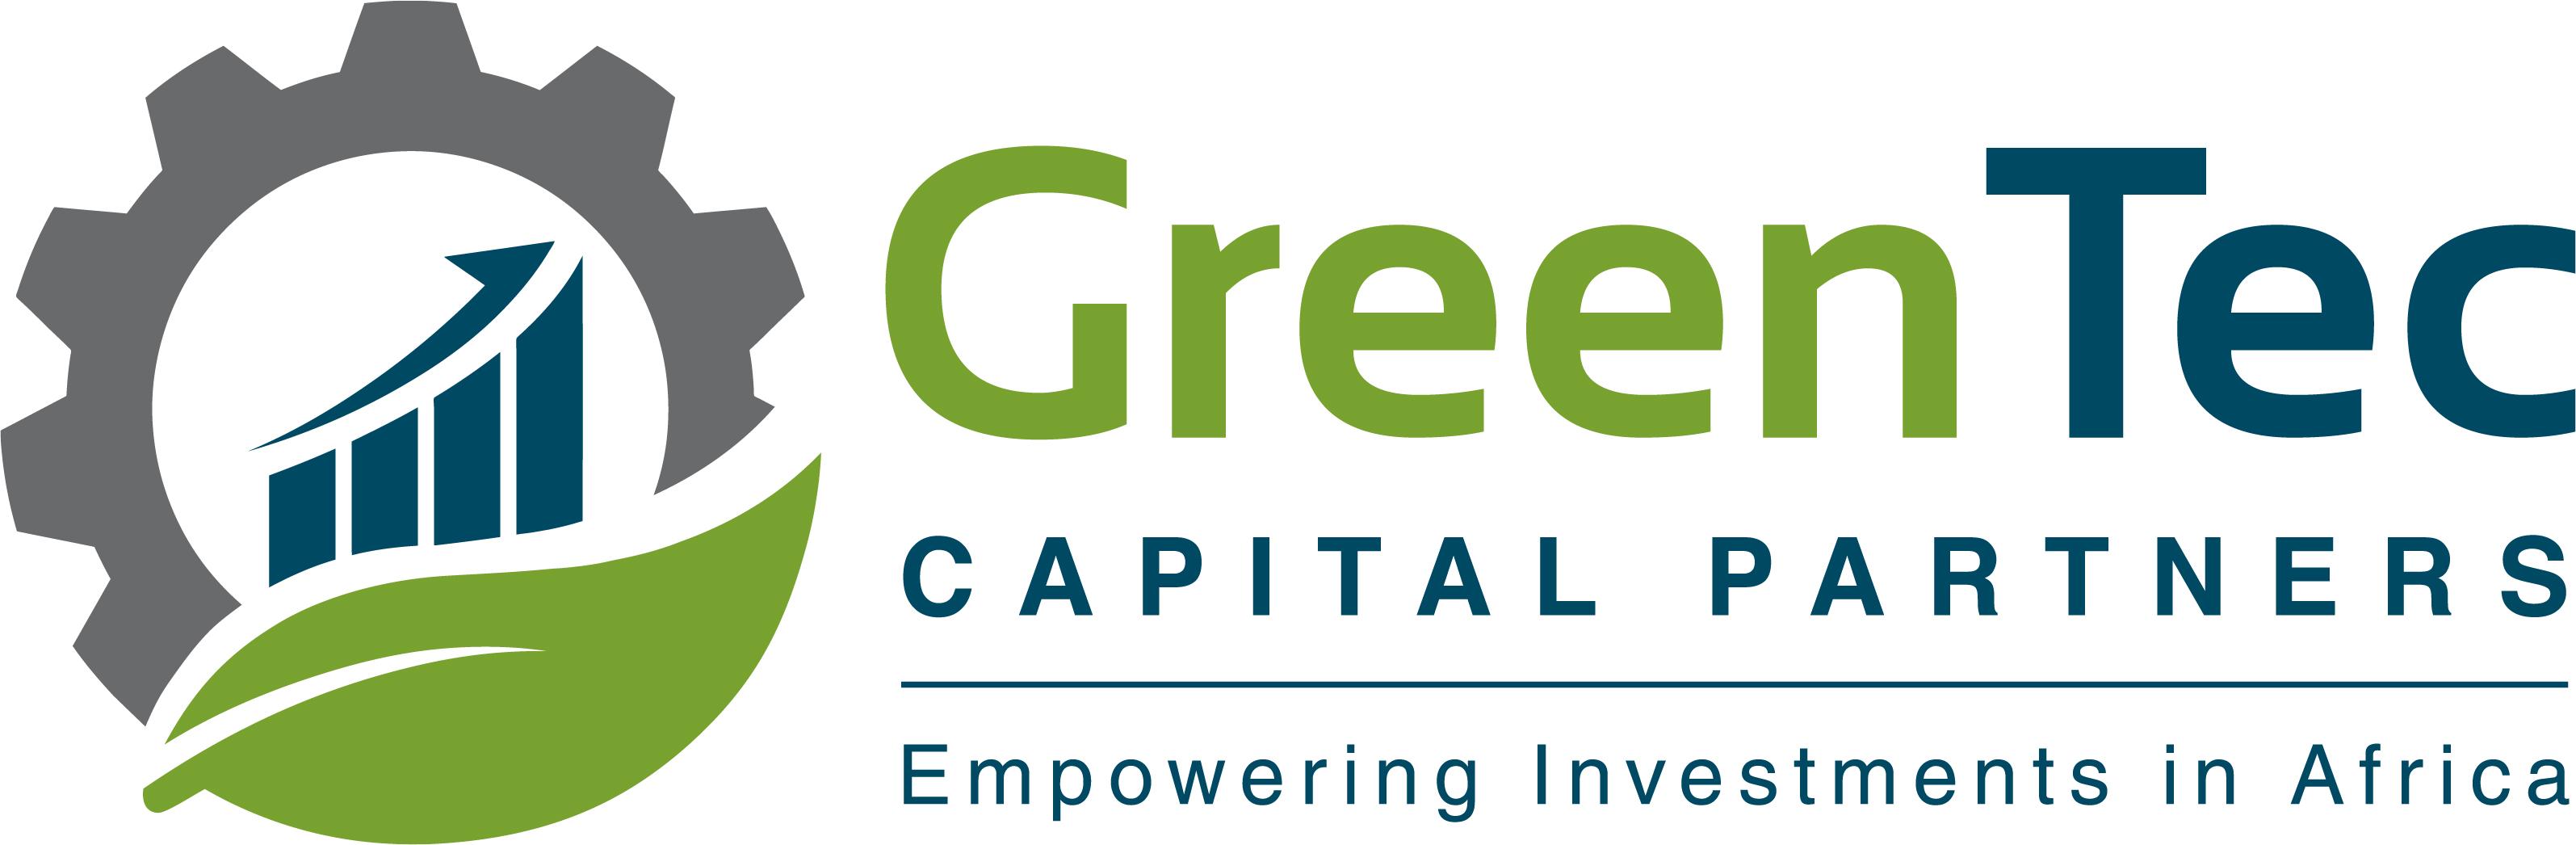 APO Group - Africa Newsroom / Press release | GreenTec Capital